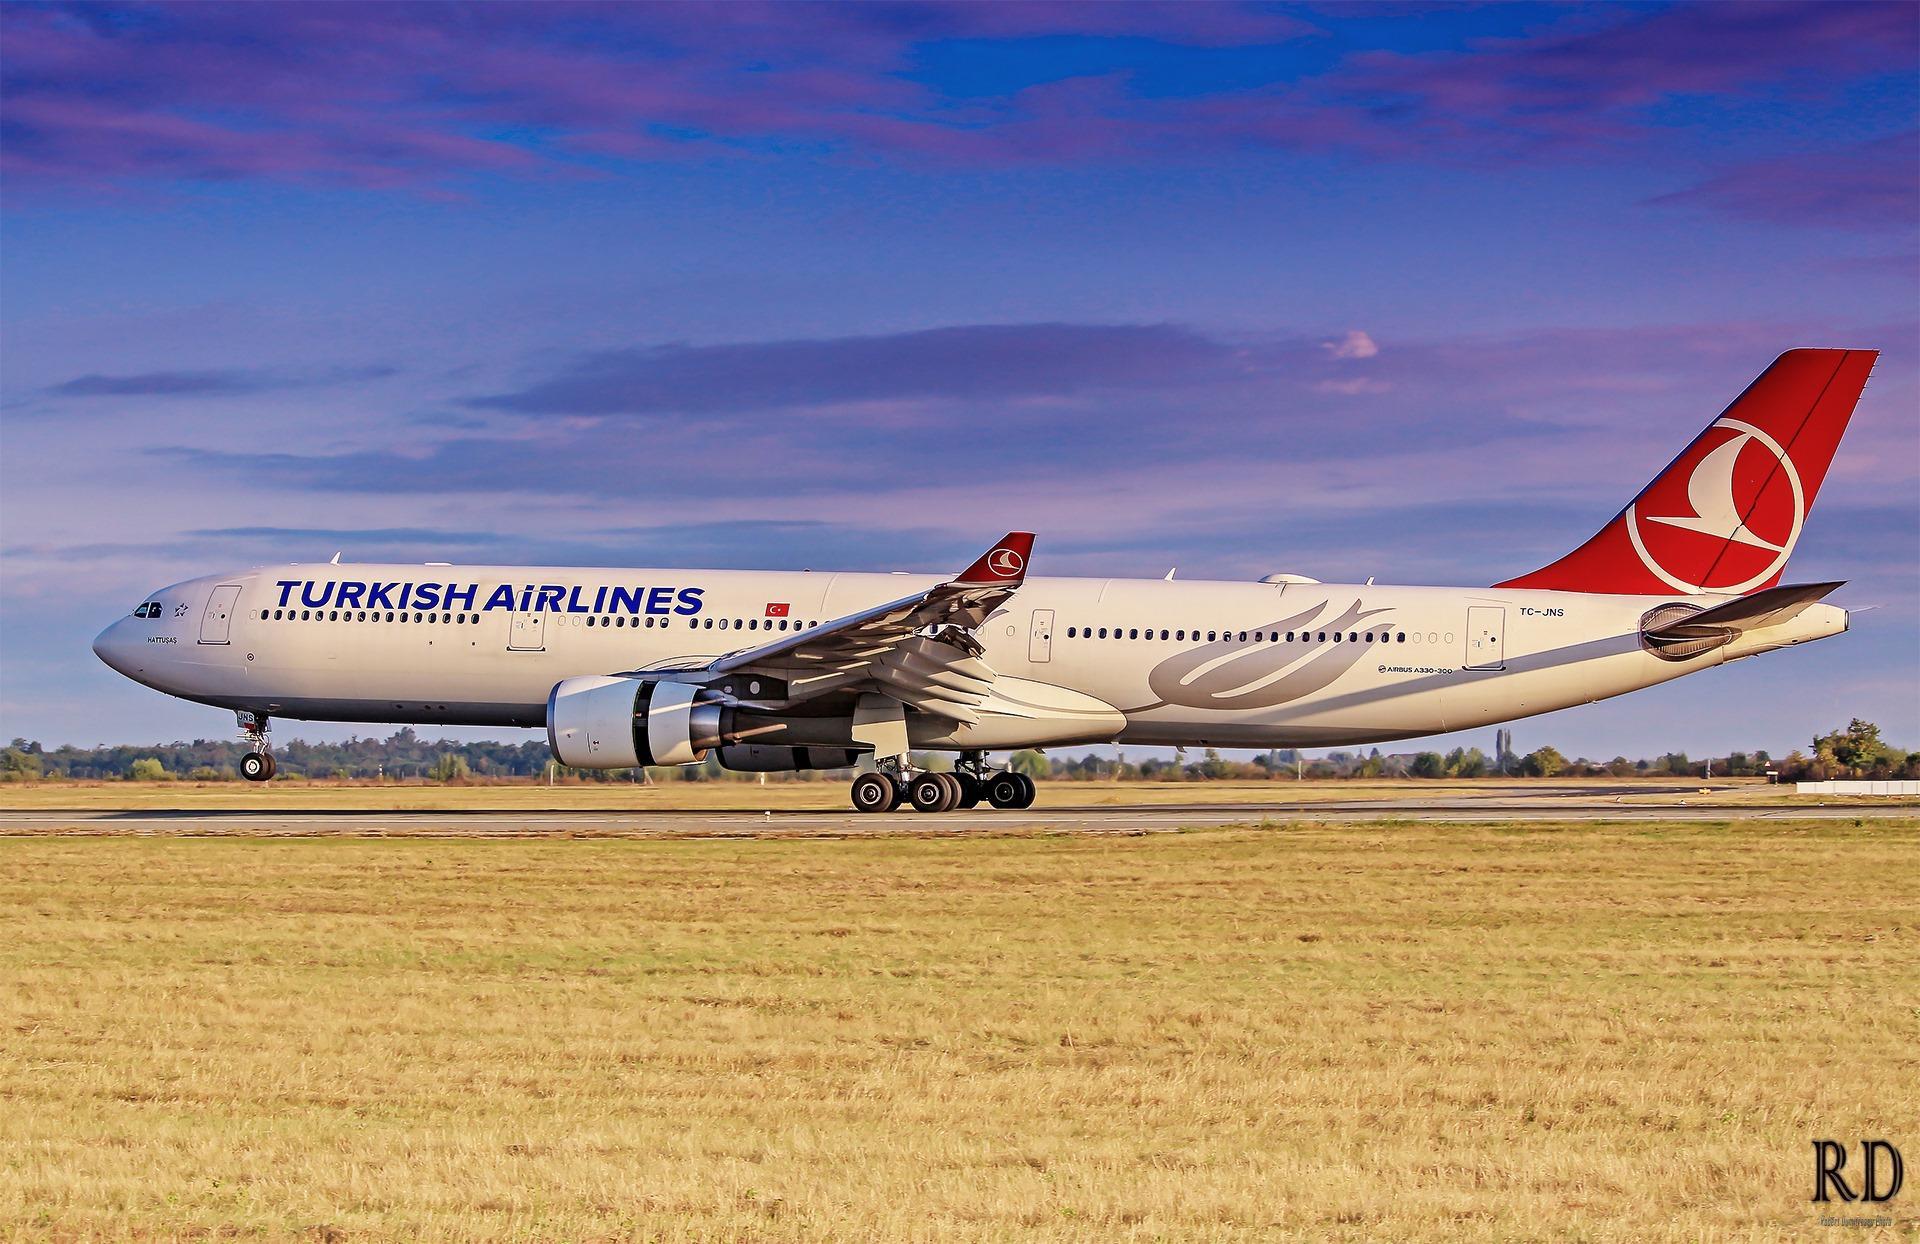 Airbus A330 Turkish Airlines la București / Foto: Robert Dumitrescu